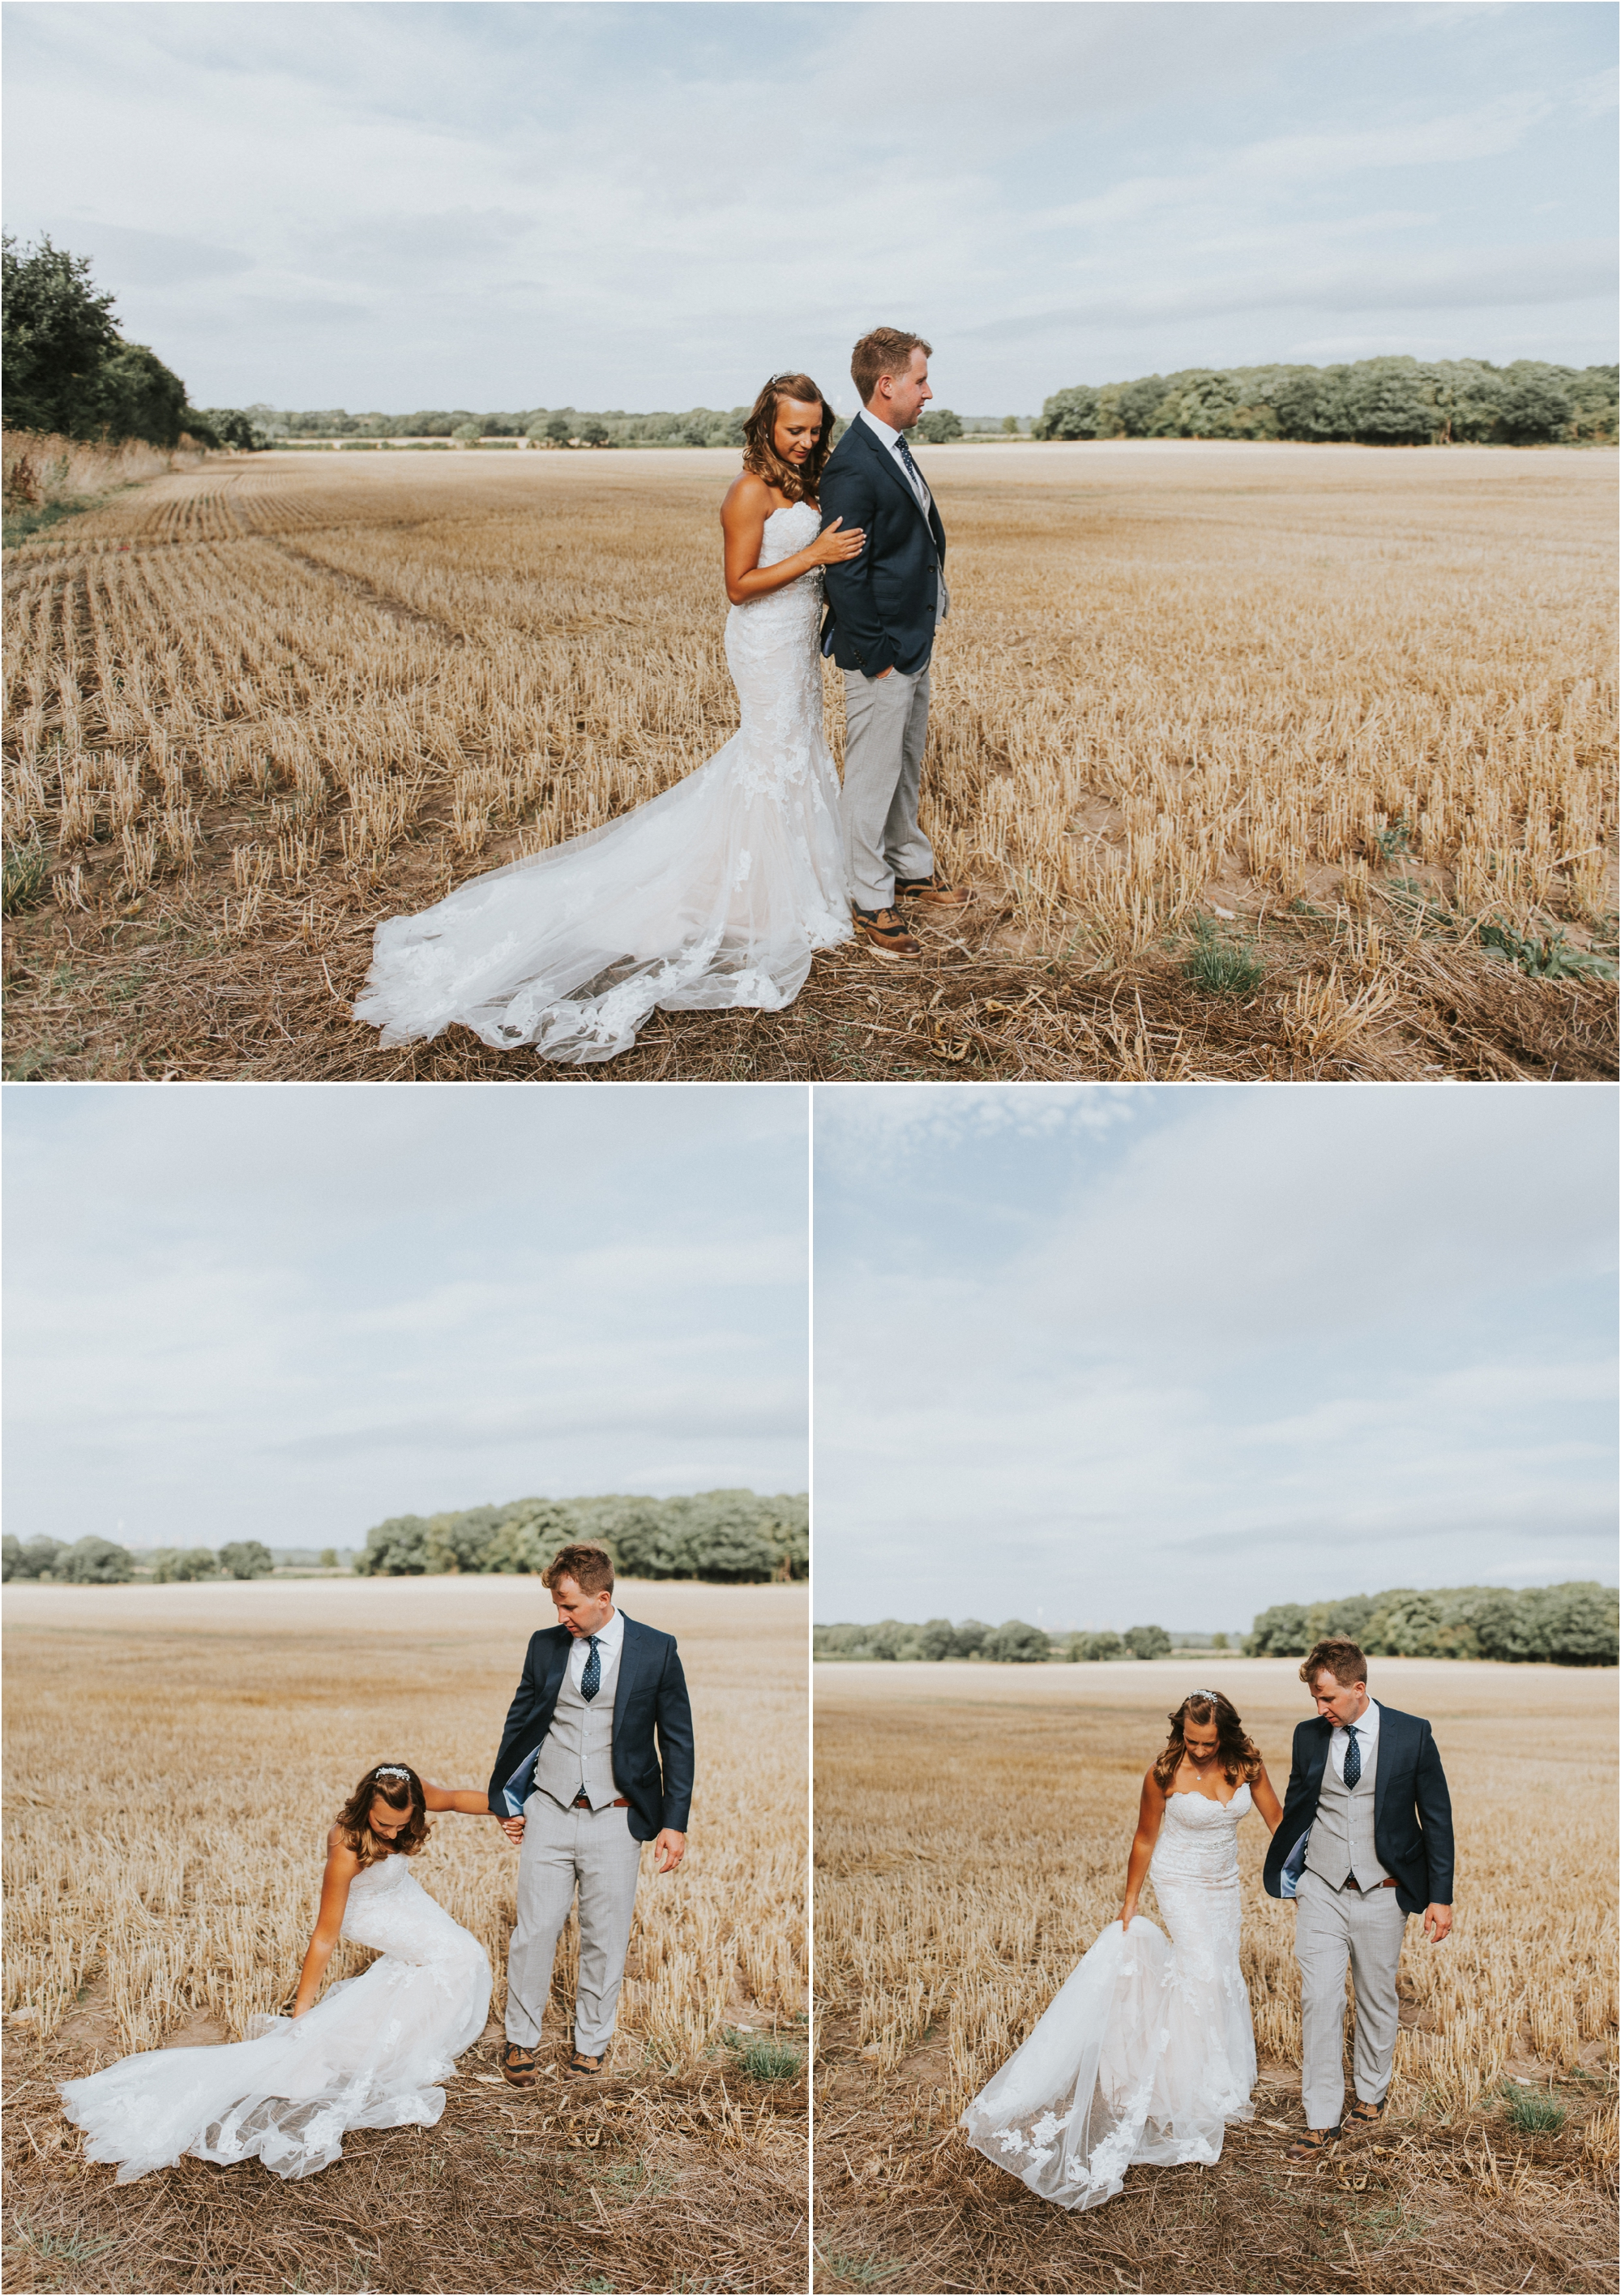 PheasantBrewery-LukeHolroyd-Yorkshirewedding_000148.jpg